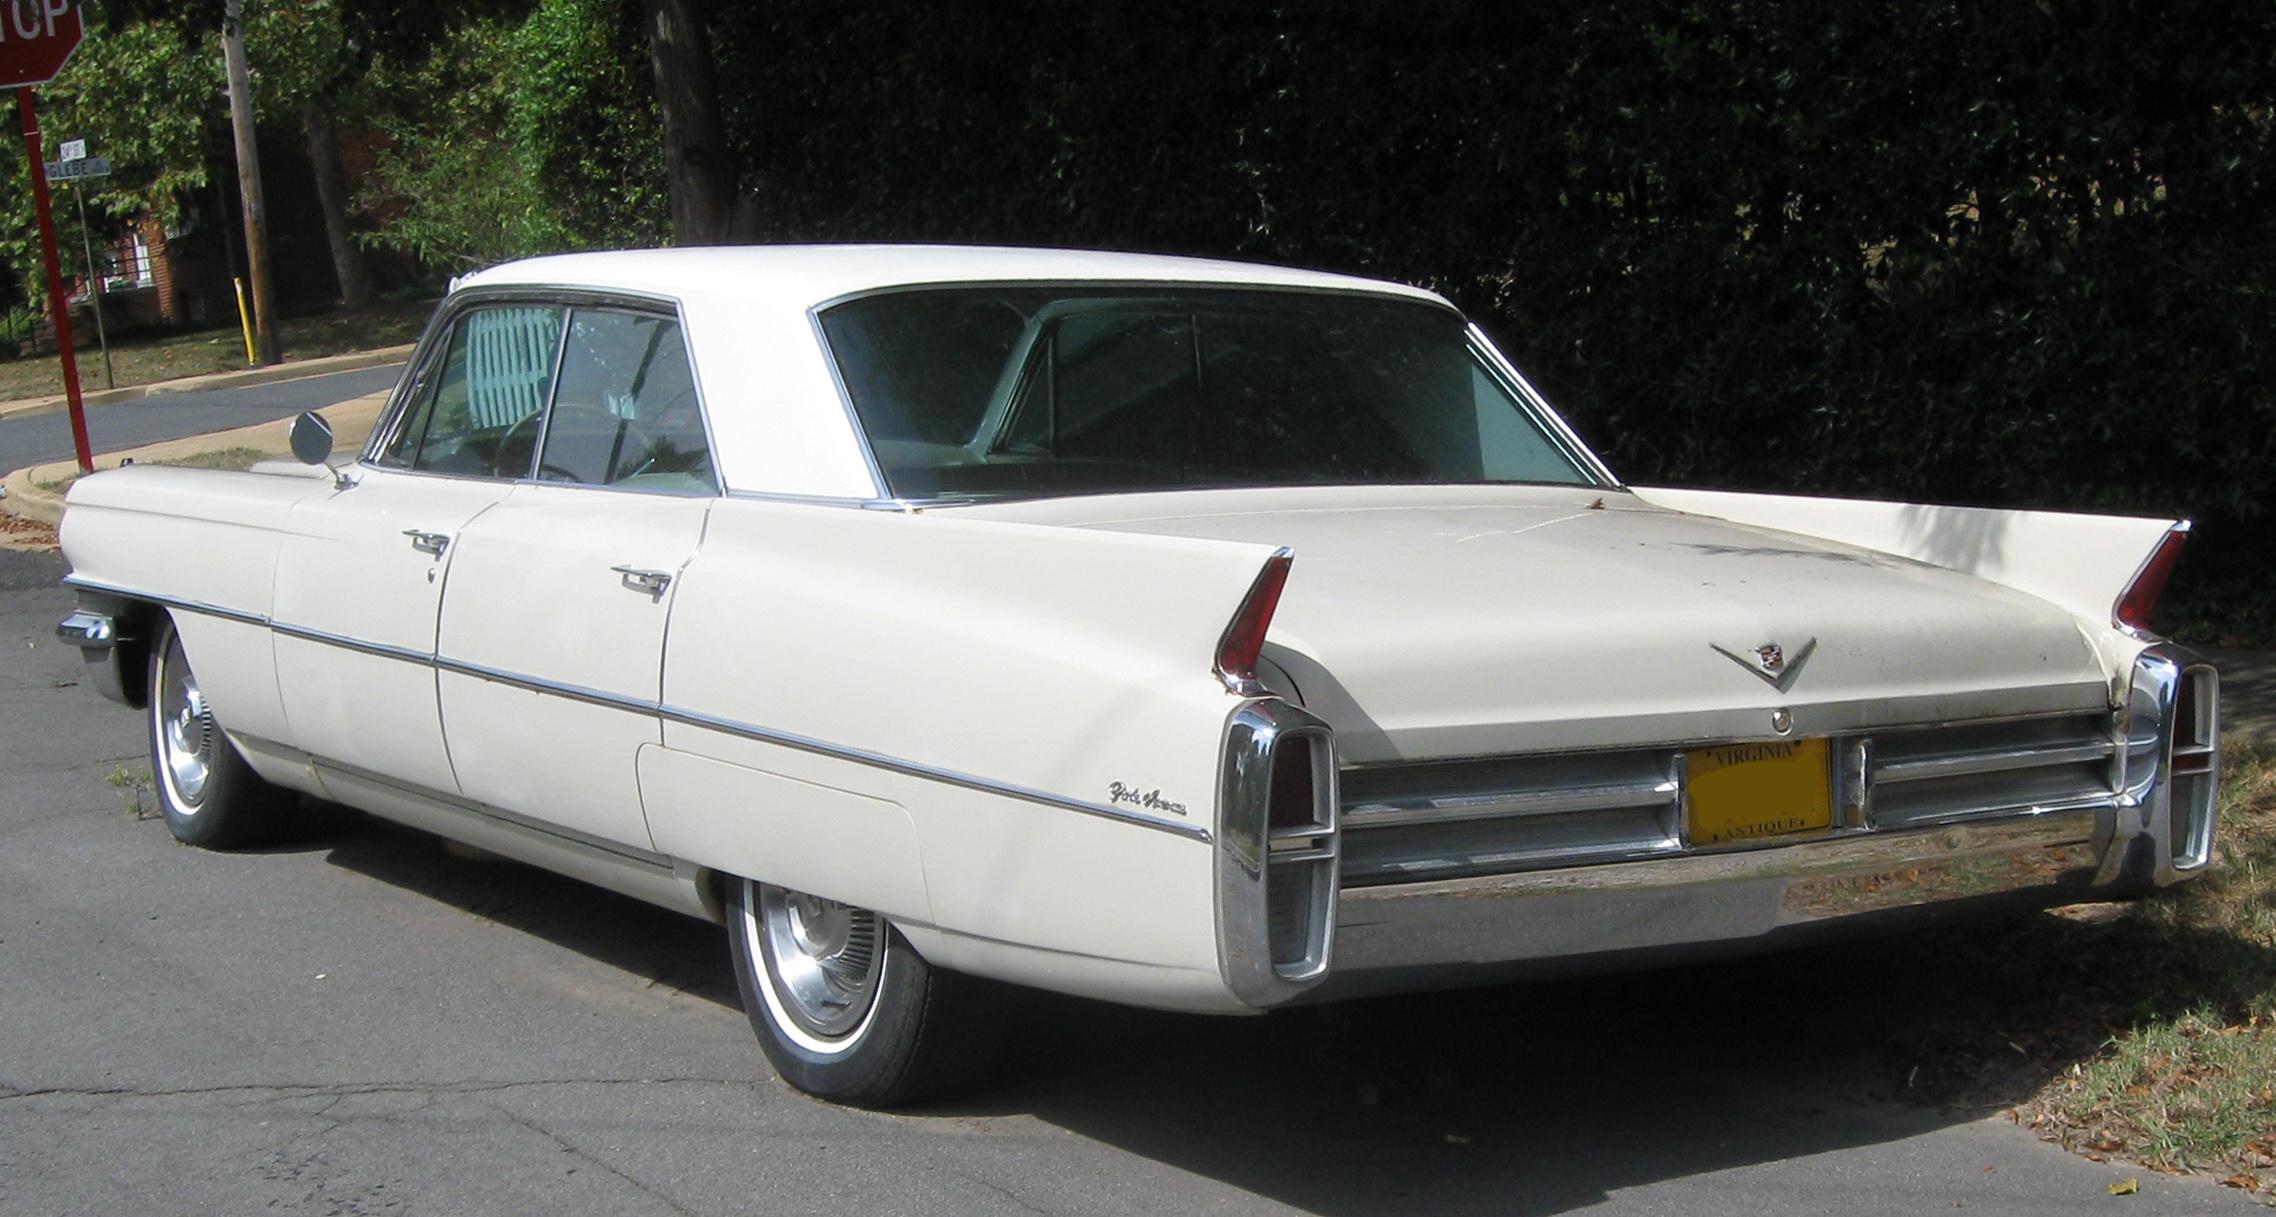 File 1976 cadillac sedan deville interior jpg wikimedia commons - File 1976 Cadillac Sedan Deville Interior Jpg Wikimedia Commons 15